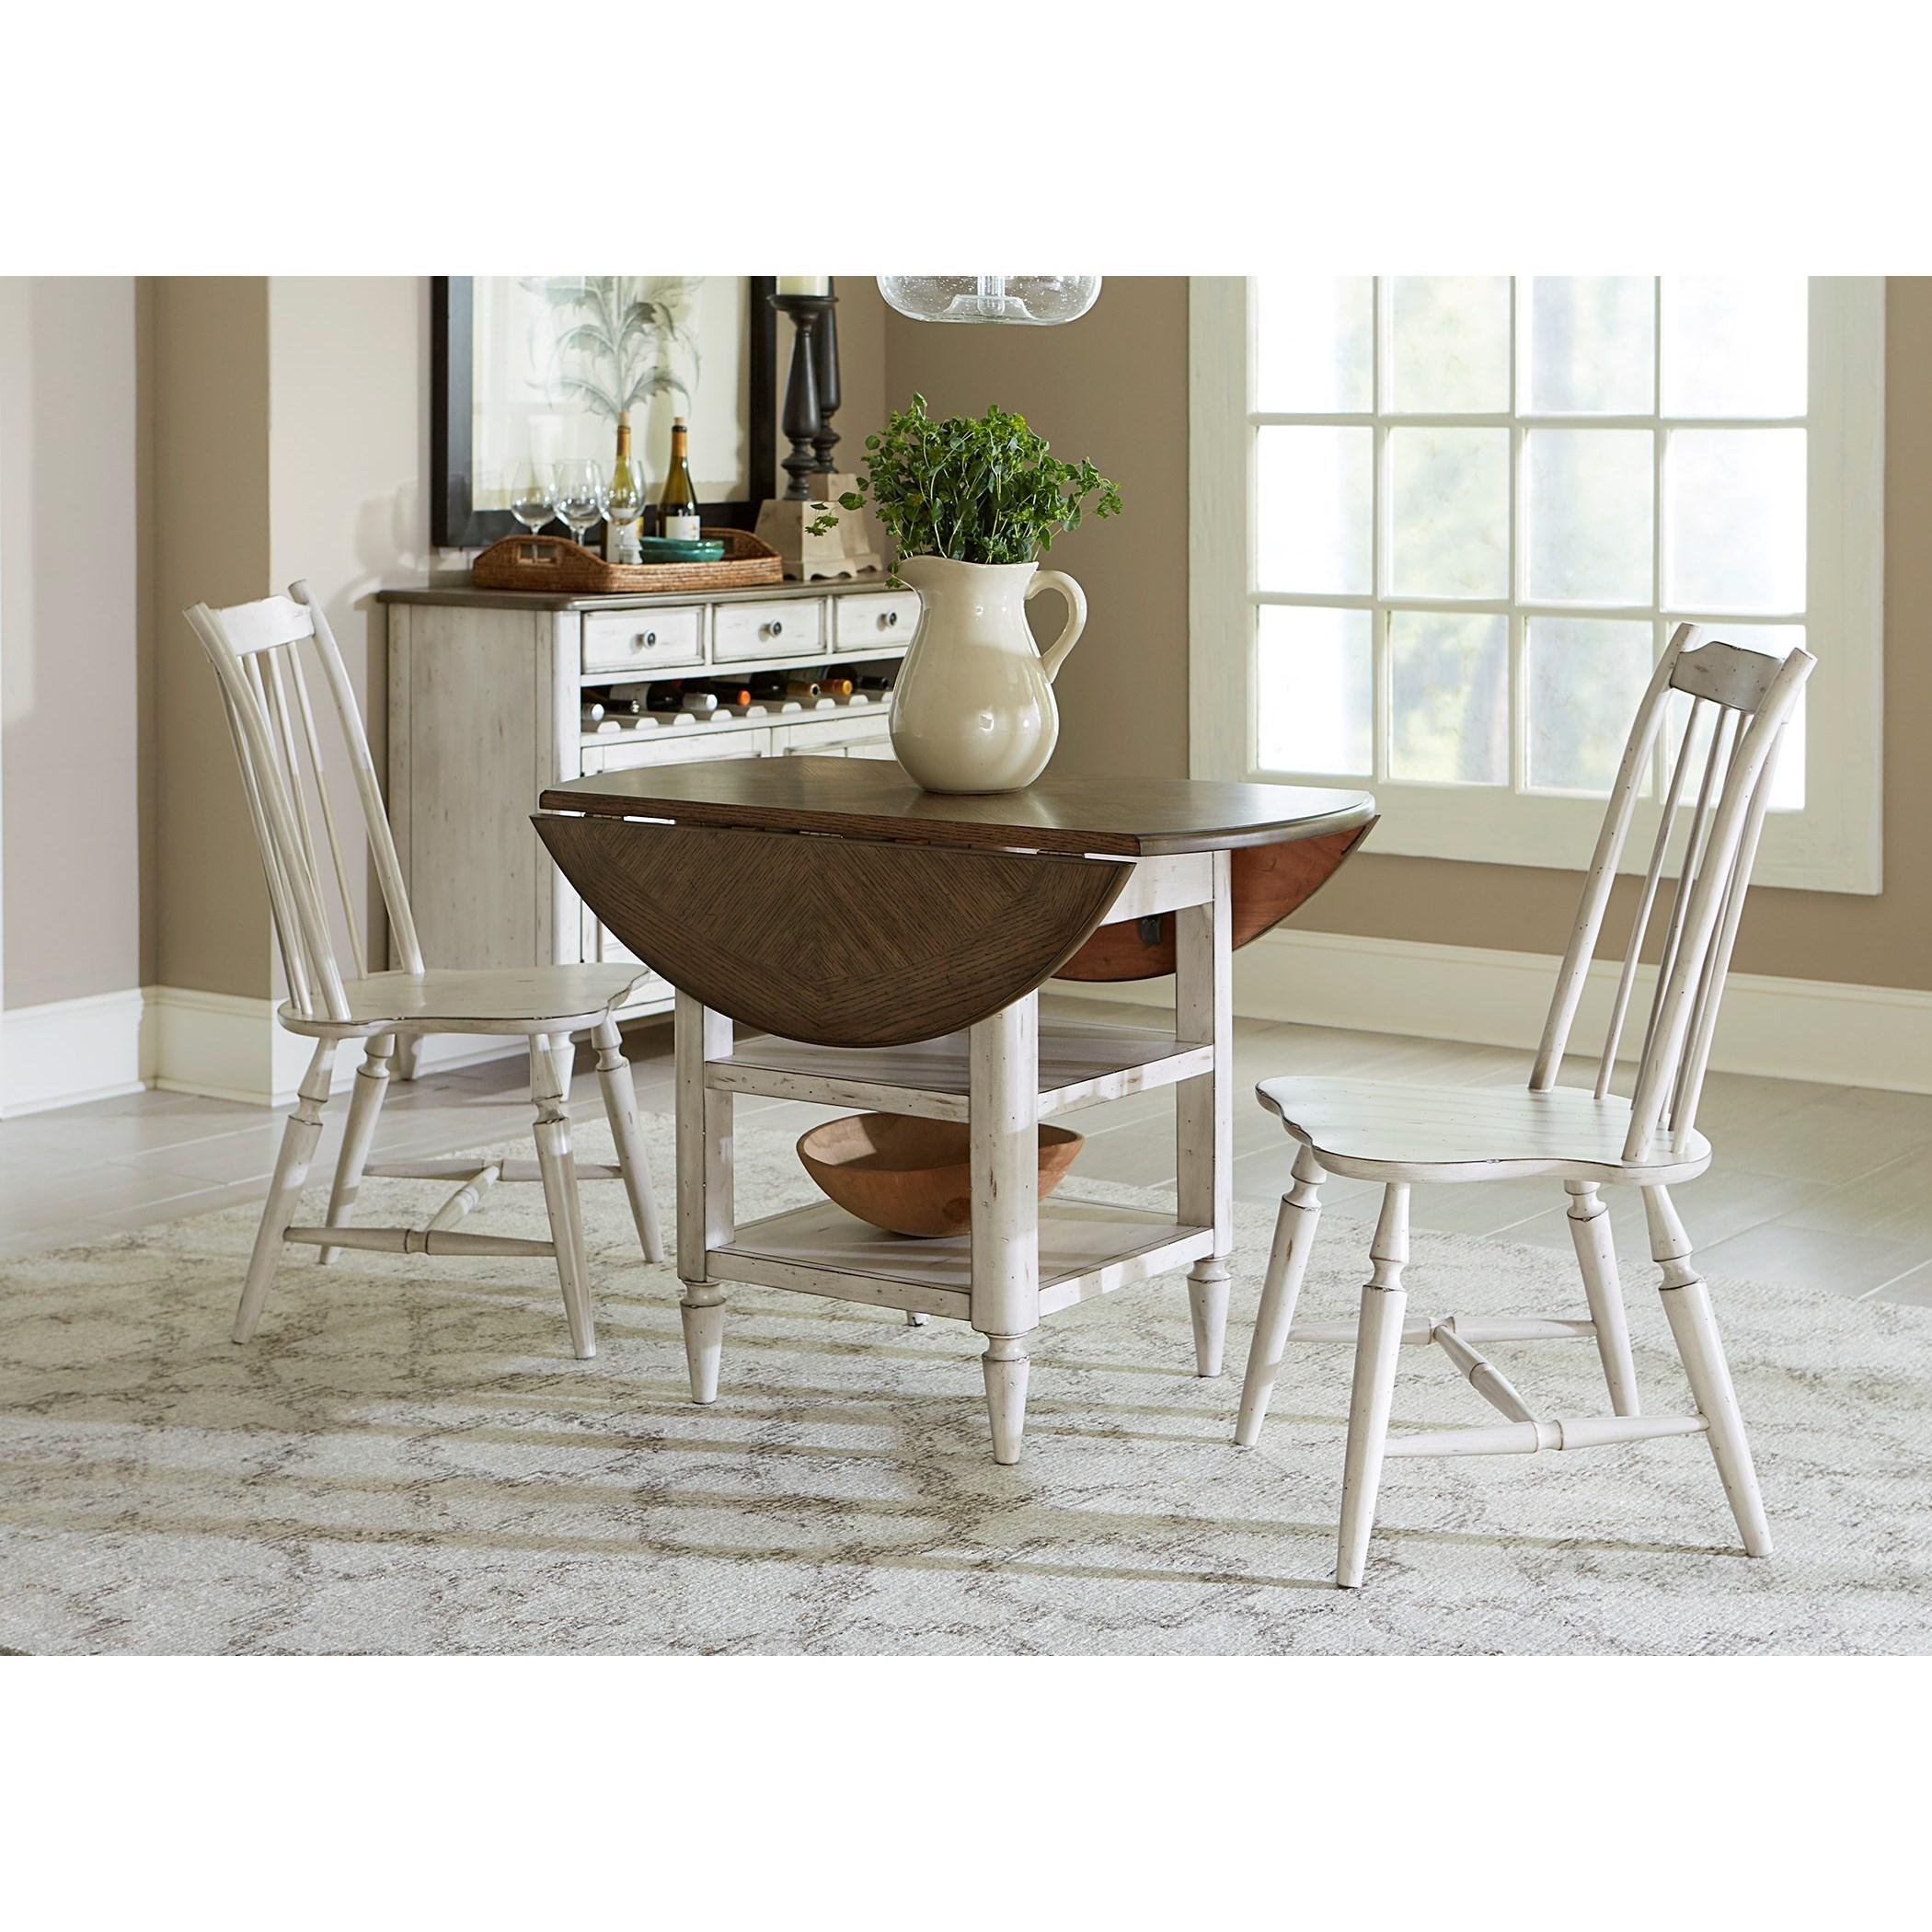 Liberty Furniture Oak Hill Dining 3 Piece Drop Leaf Table Set